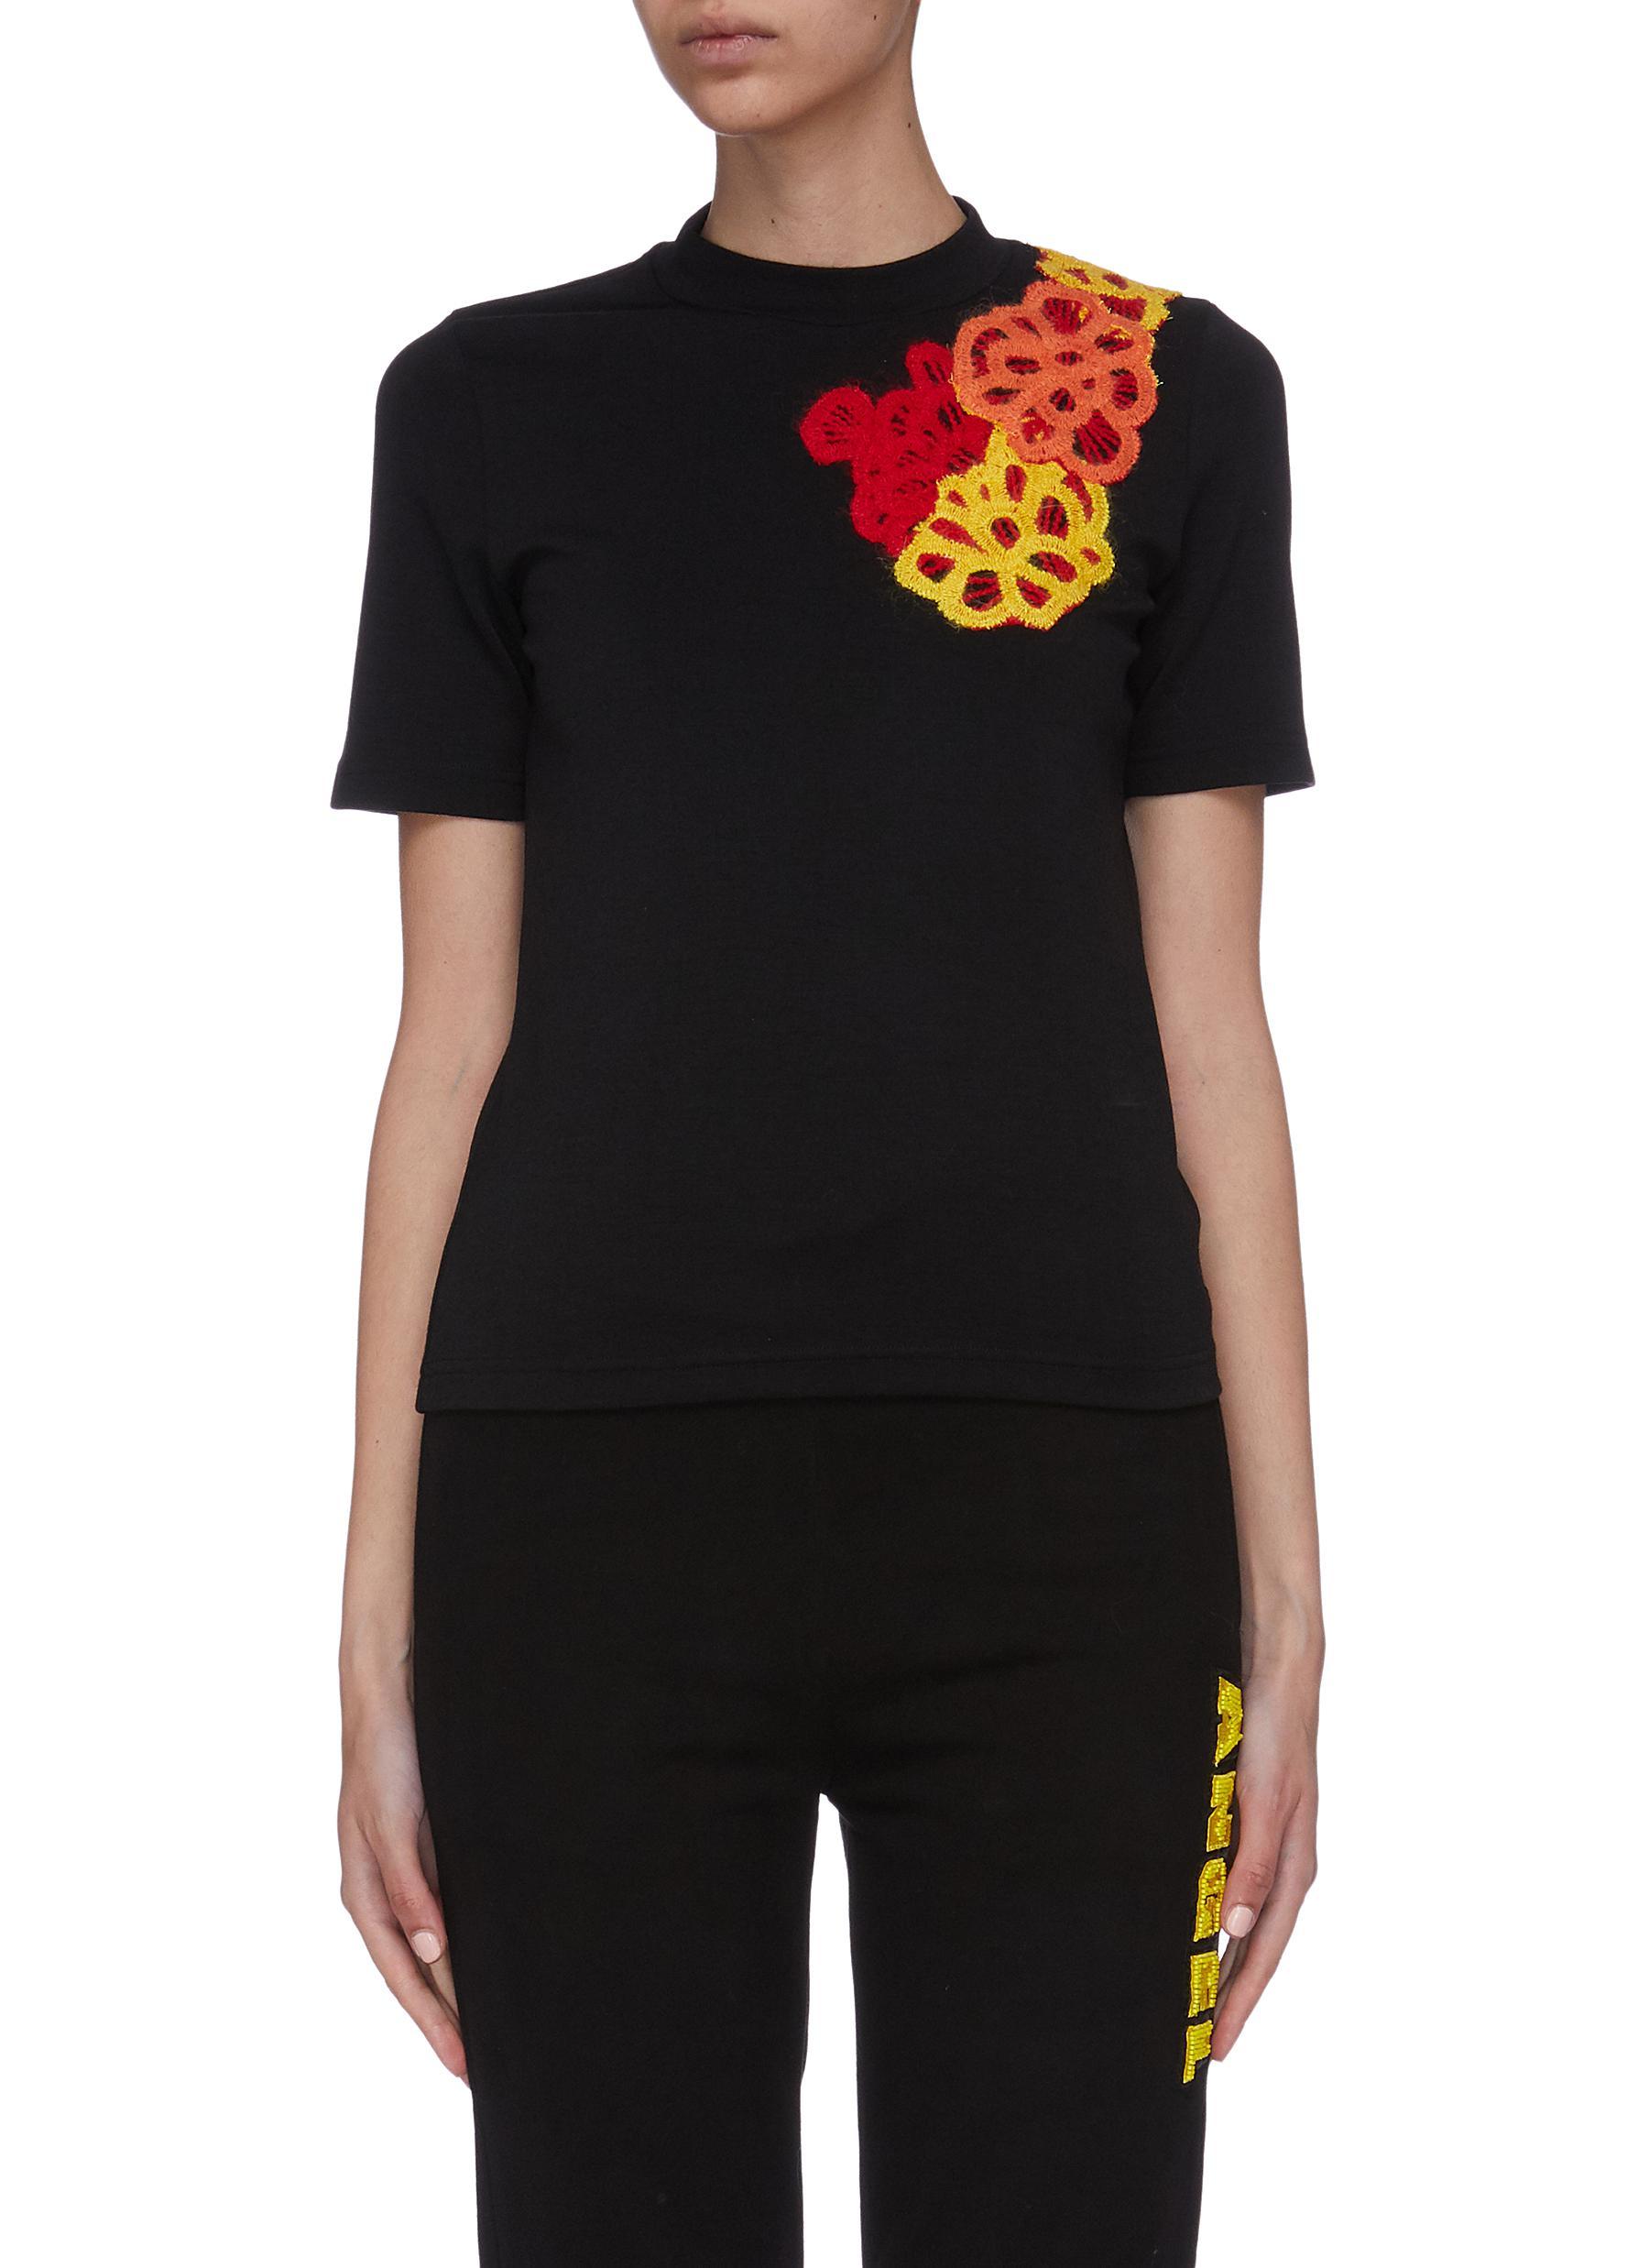 x Woolmark floral appliqué T-shirt by Angel Chen